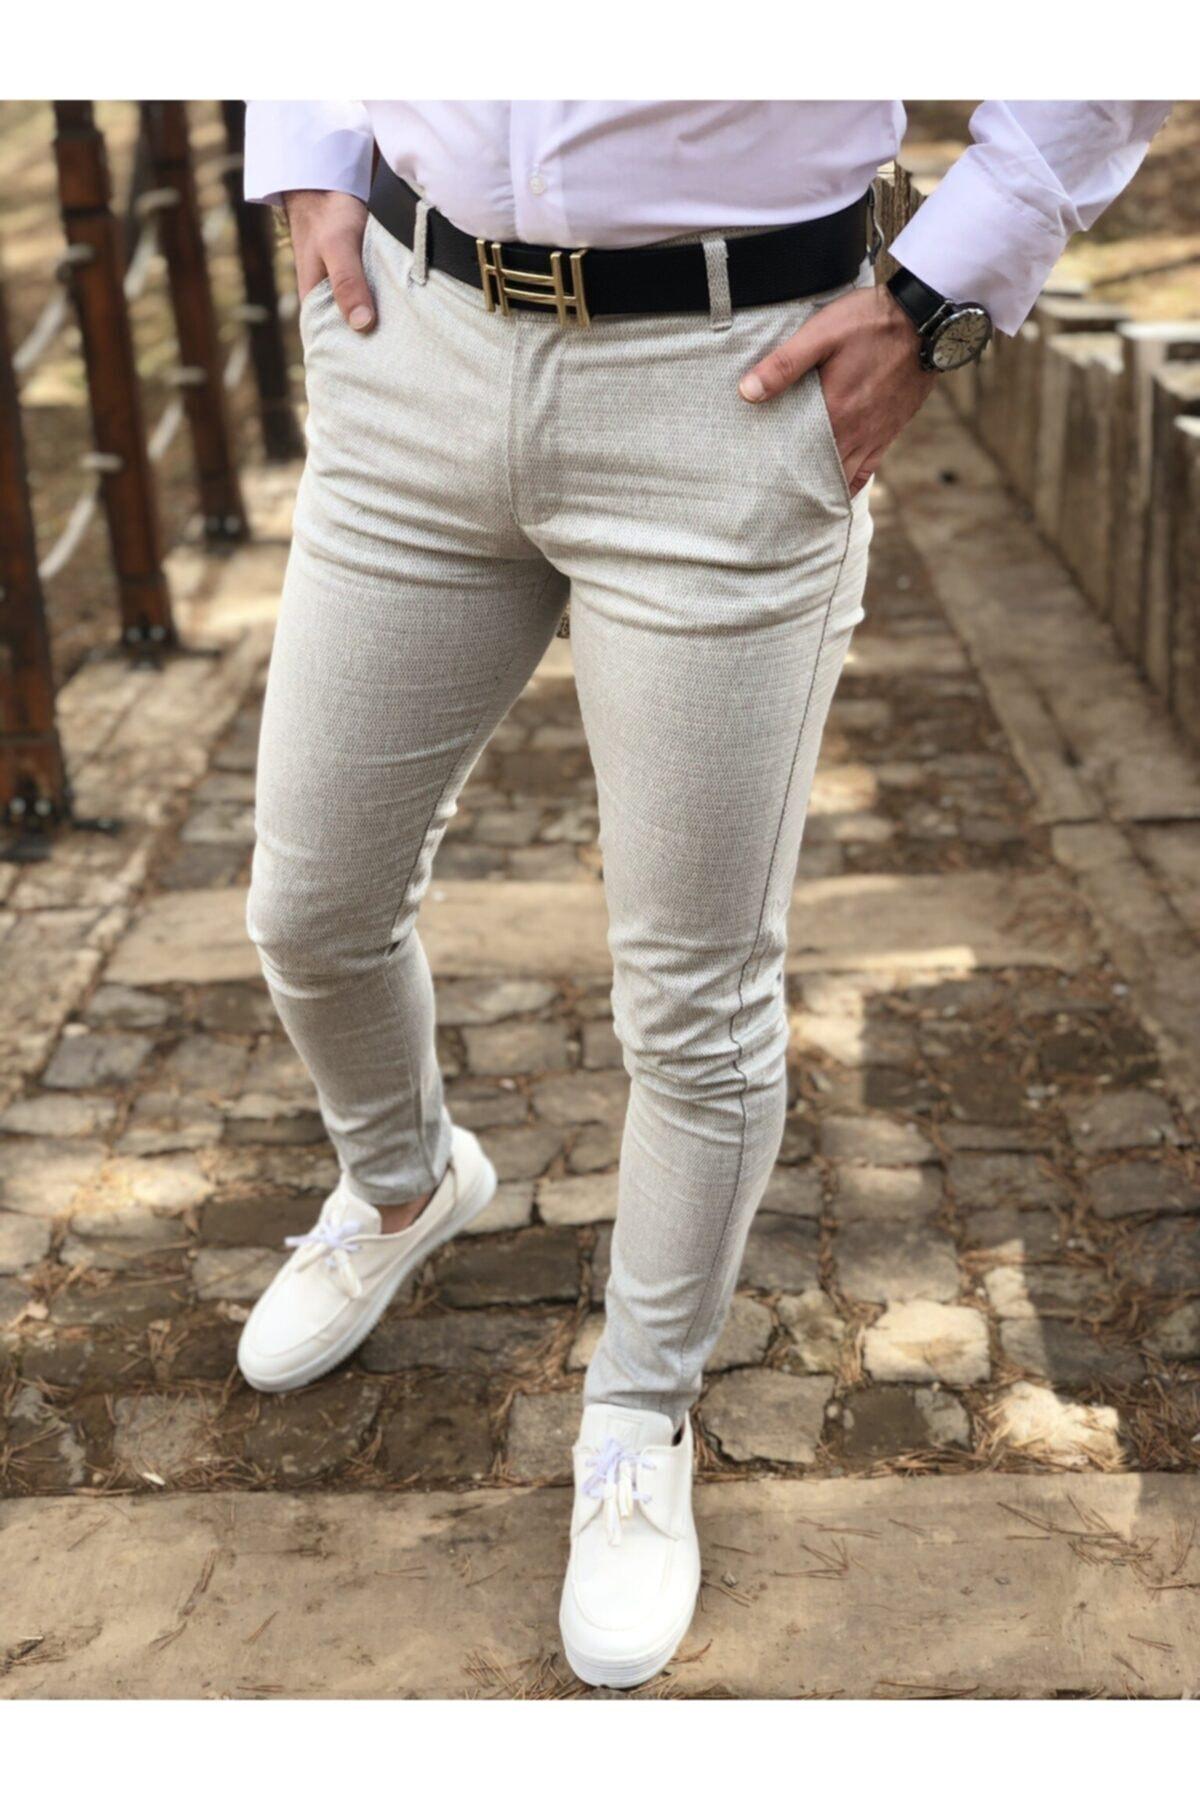 ukdwear Erkek Krem İtalyan Kesim Petek Desen Keten Pantolon 1